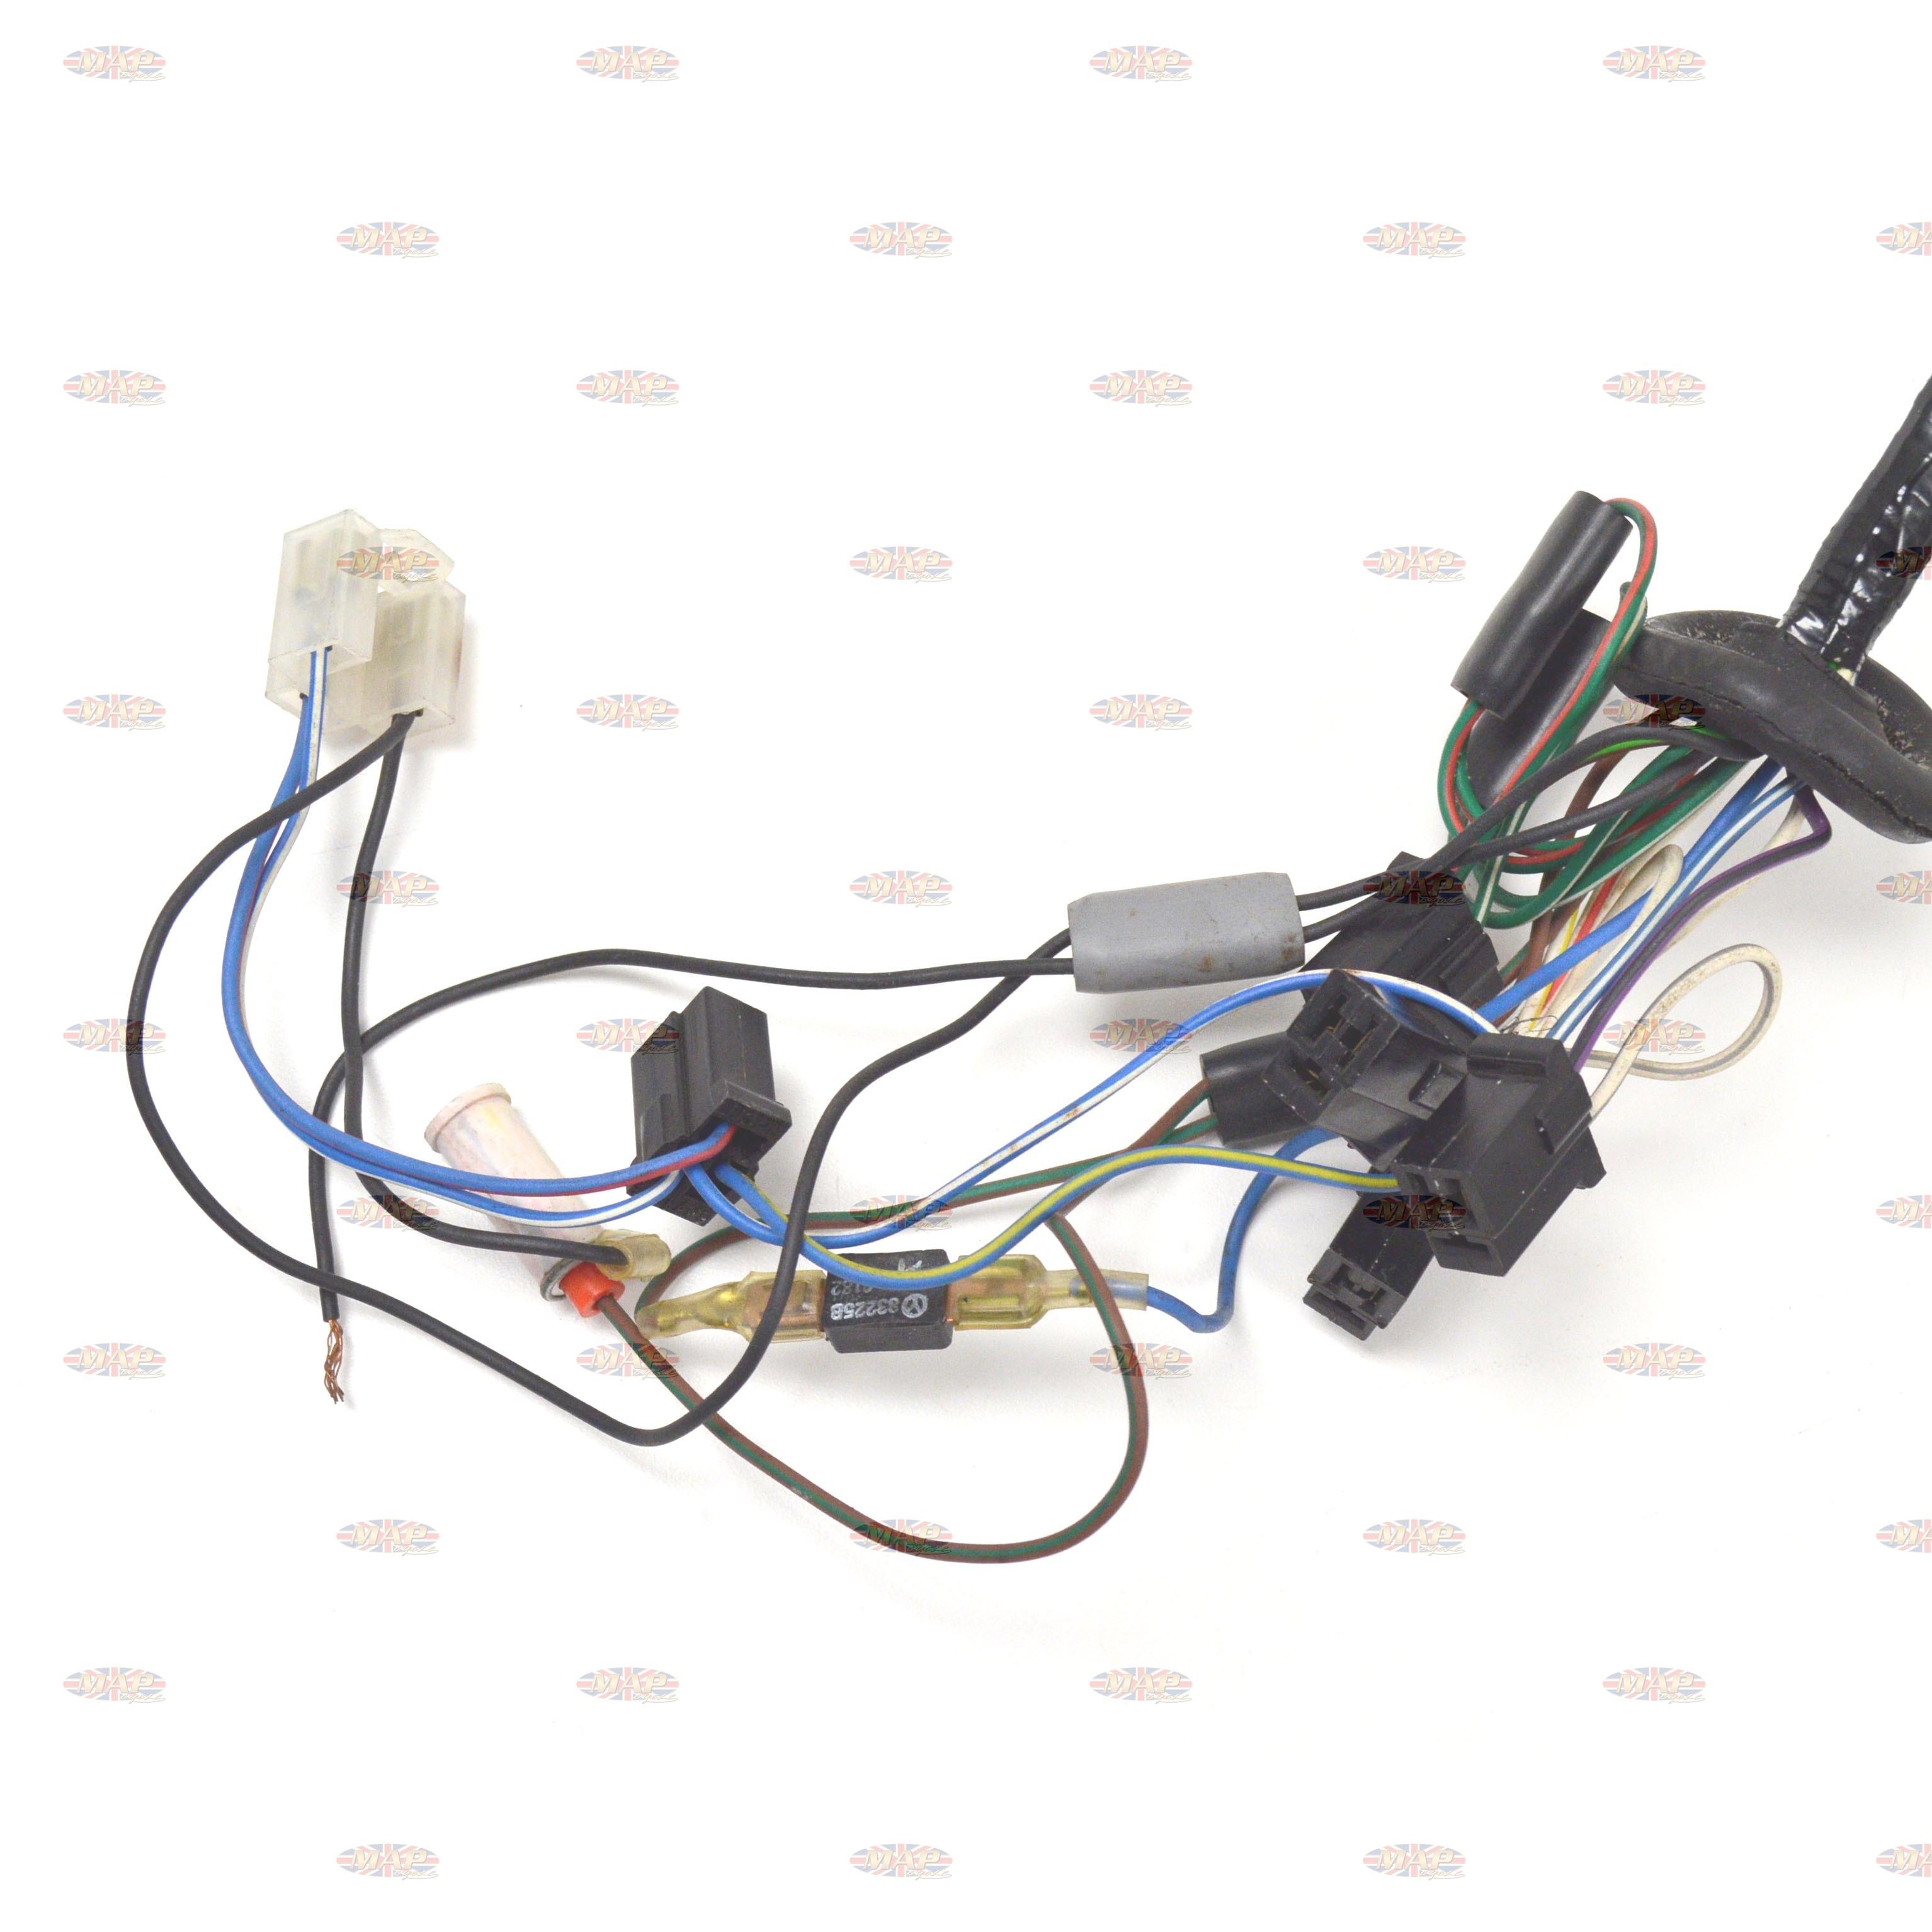 triumph wiring harness triumph 1981-82 t140 tsx factory lucas wiring harness